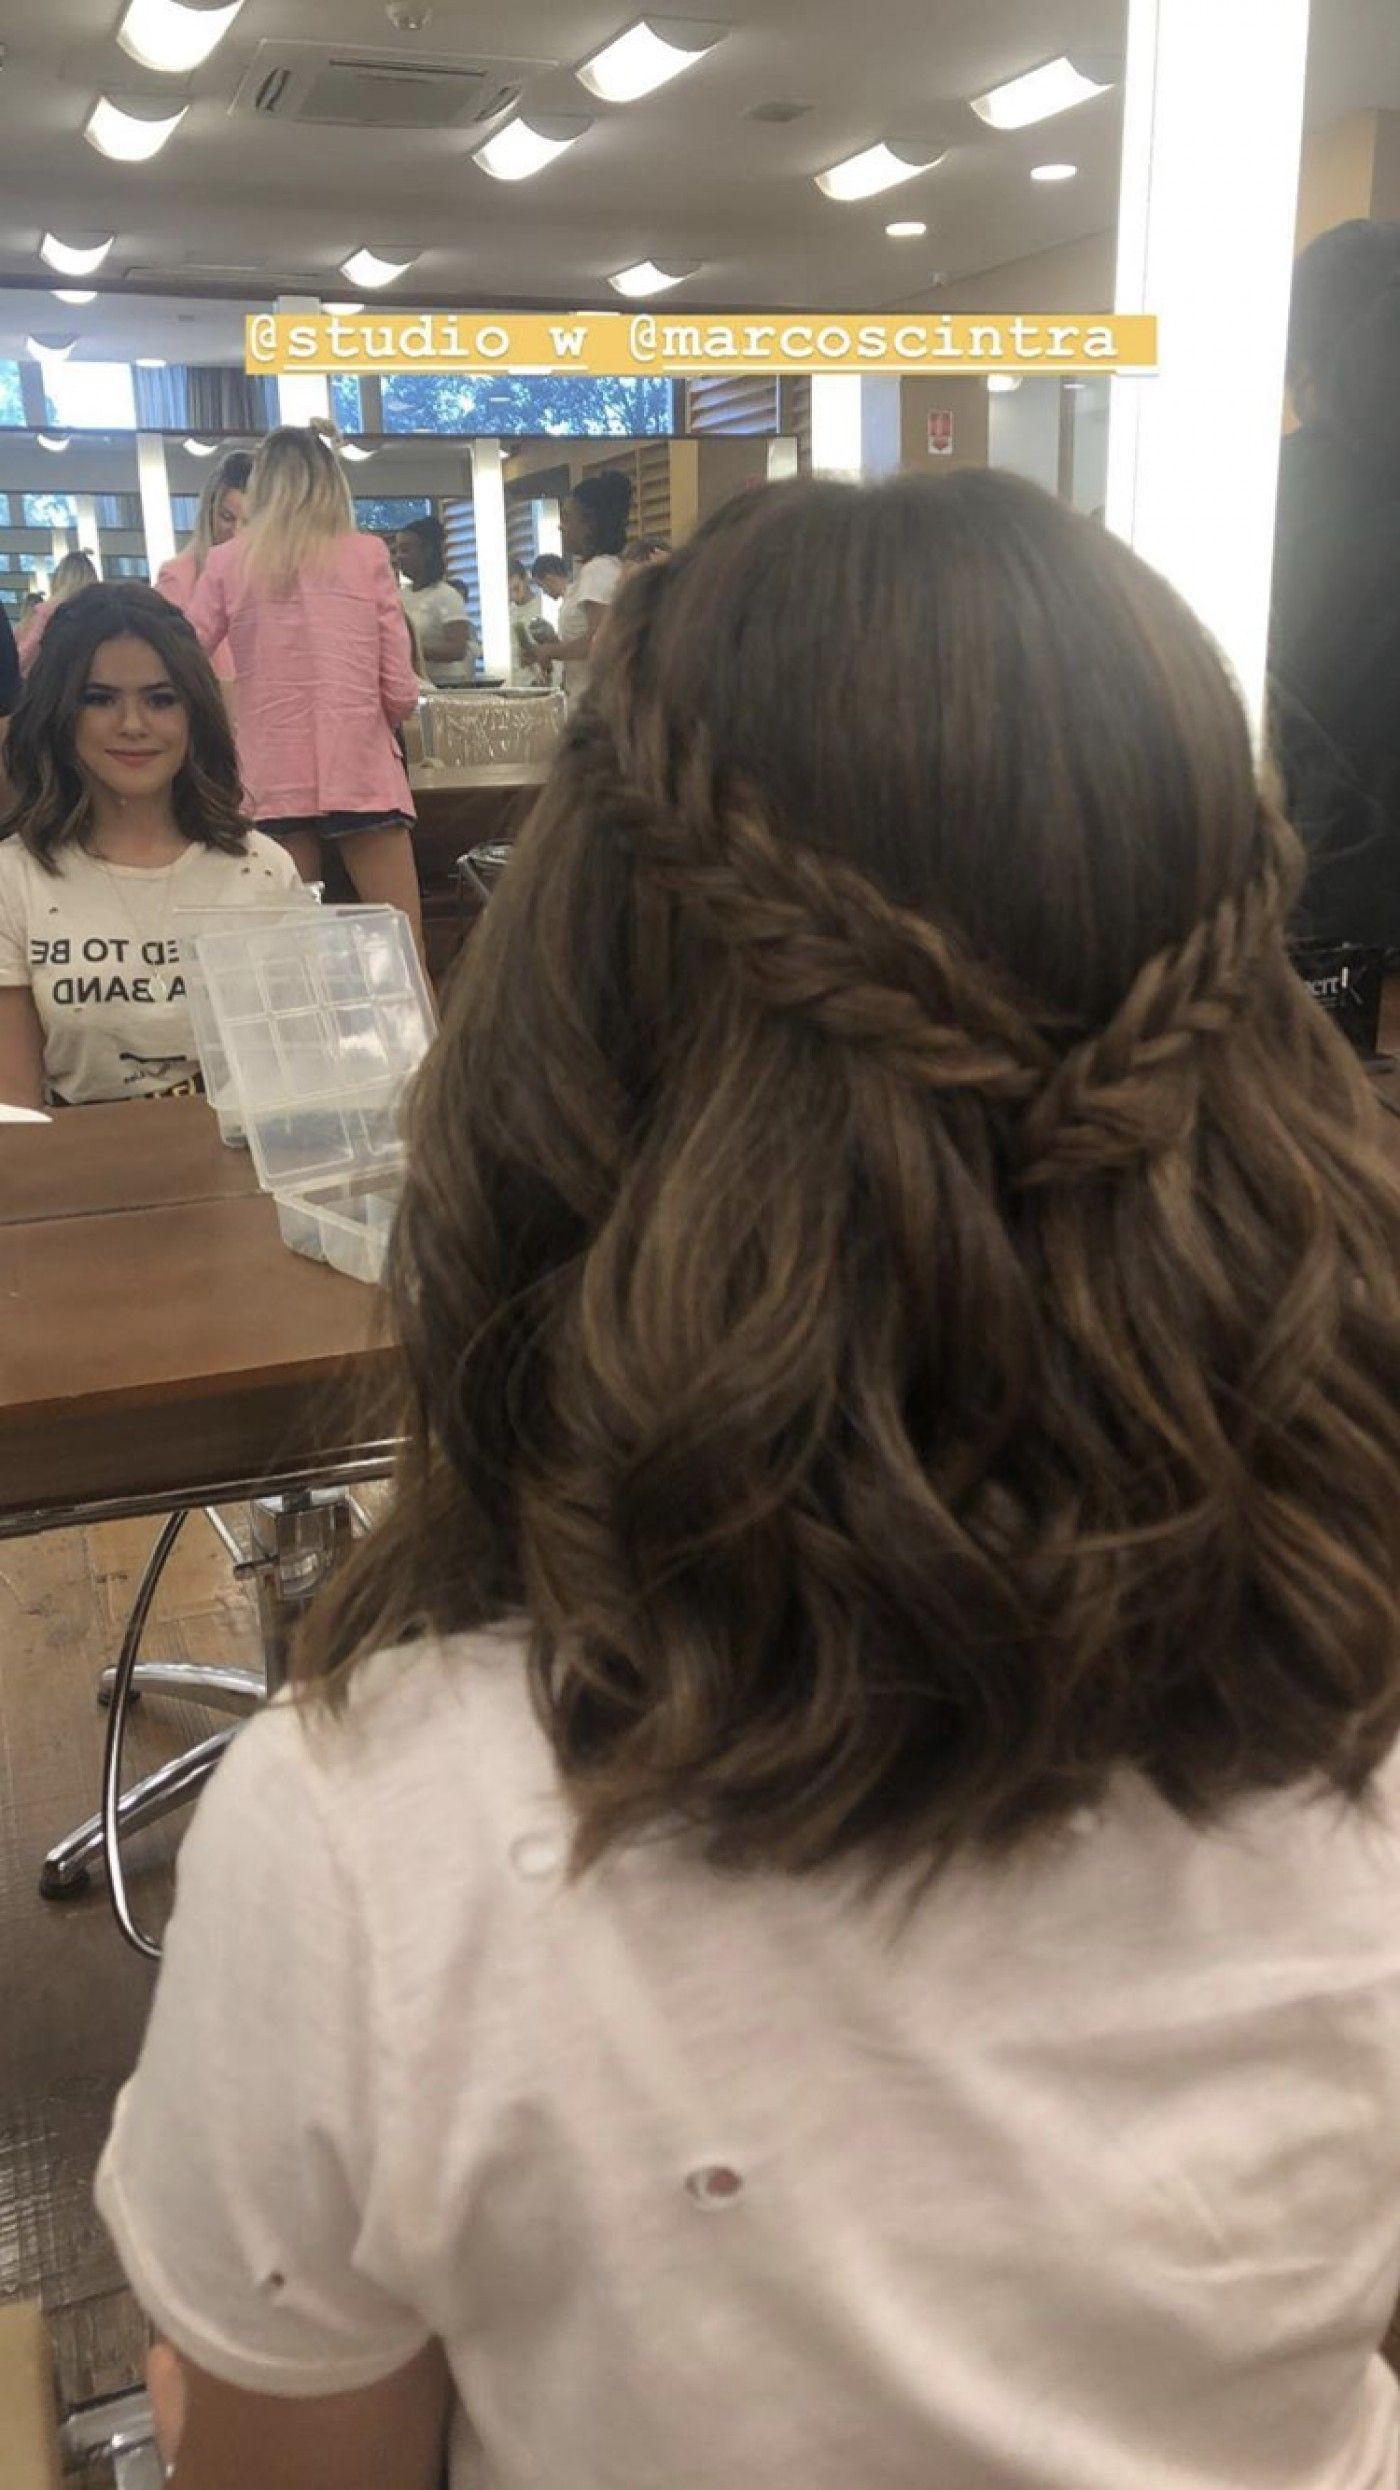 039 Graduation Hairstyles For Short Hair Unusual Grad Natural